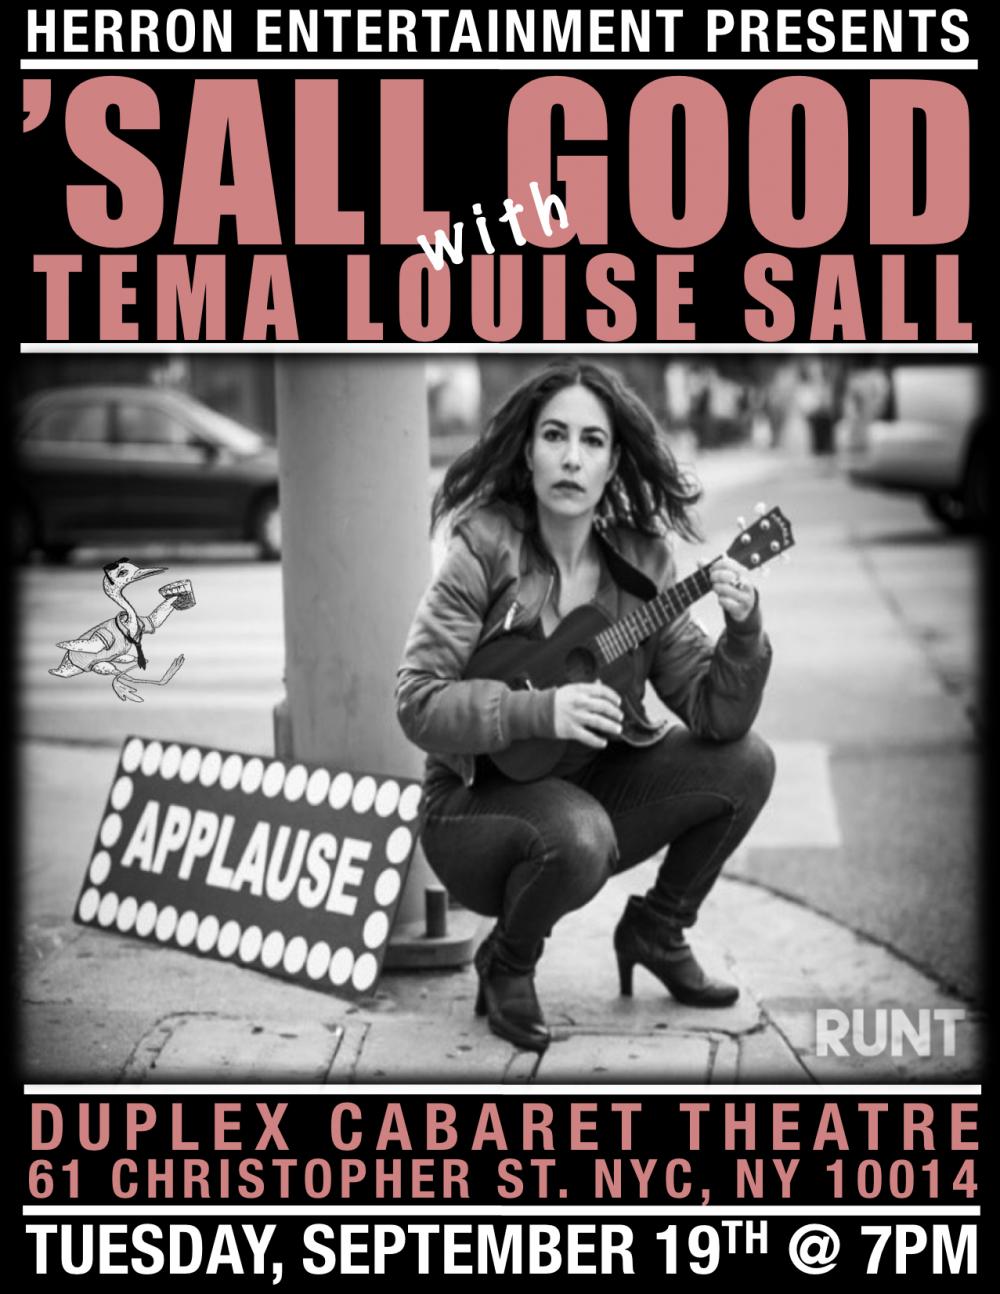 Sall Good With Tema Louise Sall Purplepass